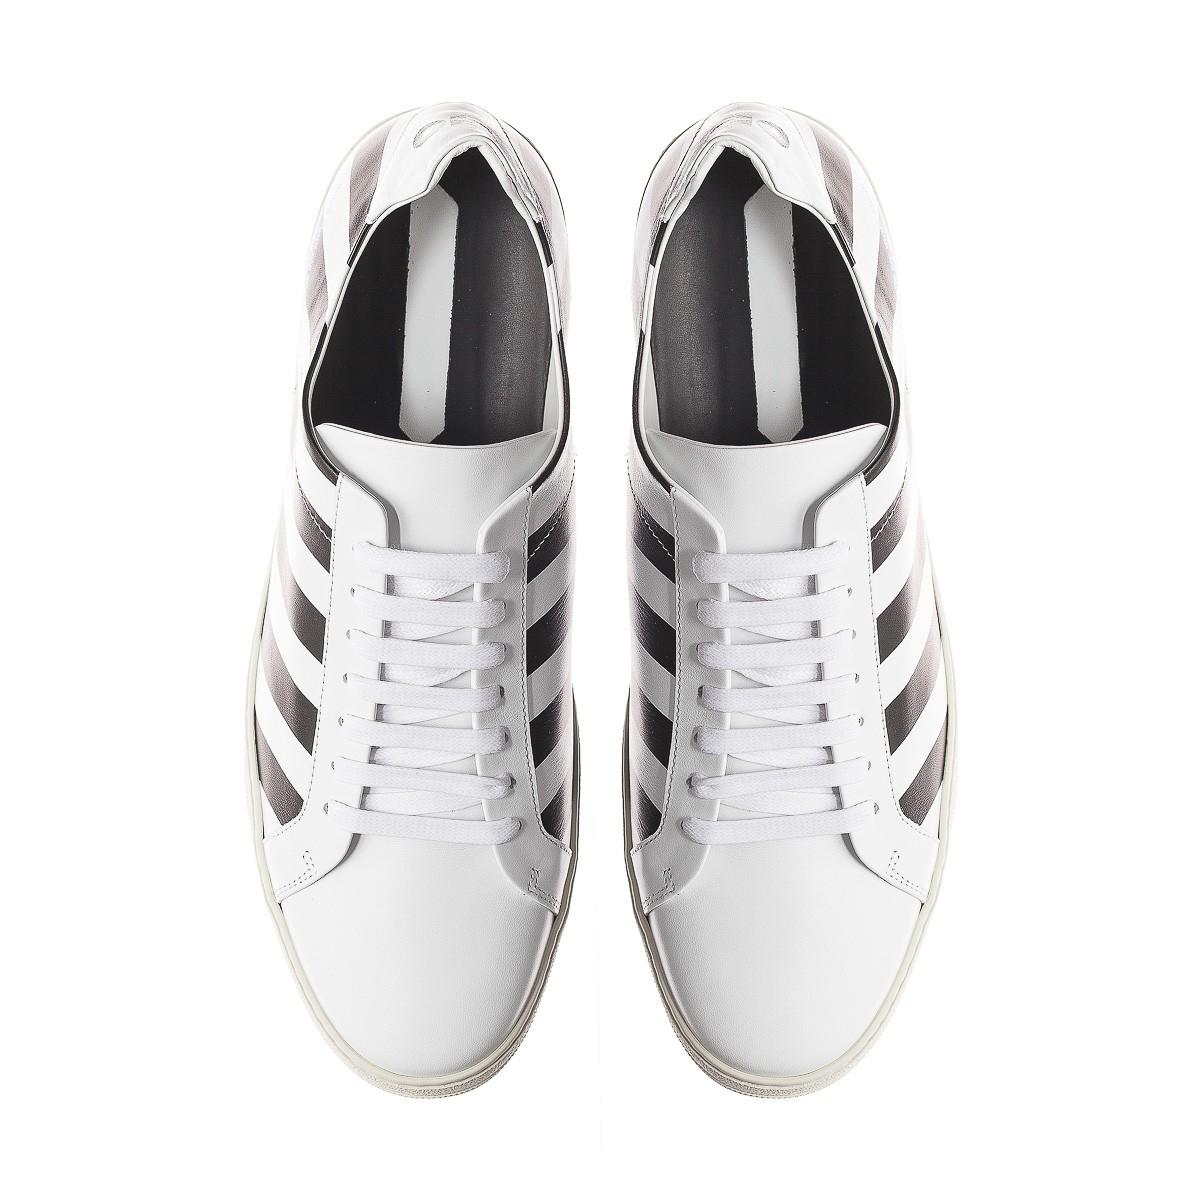 a651b0c0135d Lyst - Off-White c o Virgil Abloh Diagonals Sneakers in Black for Men